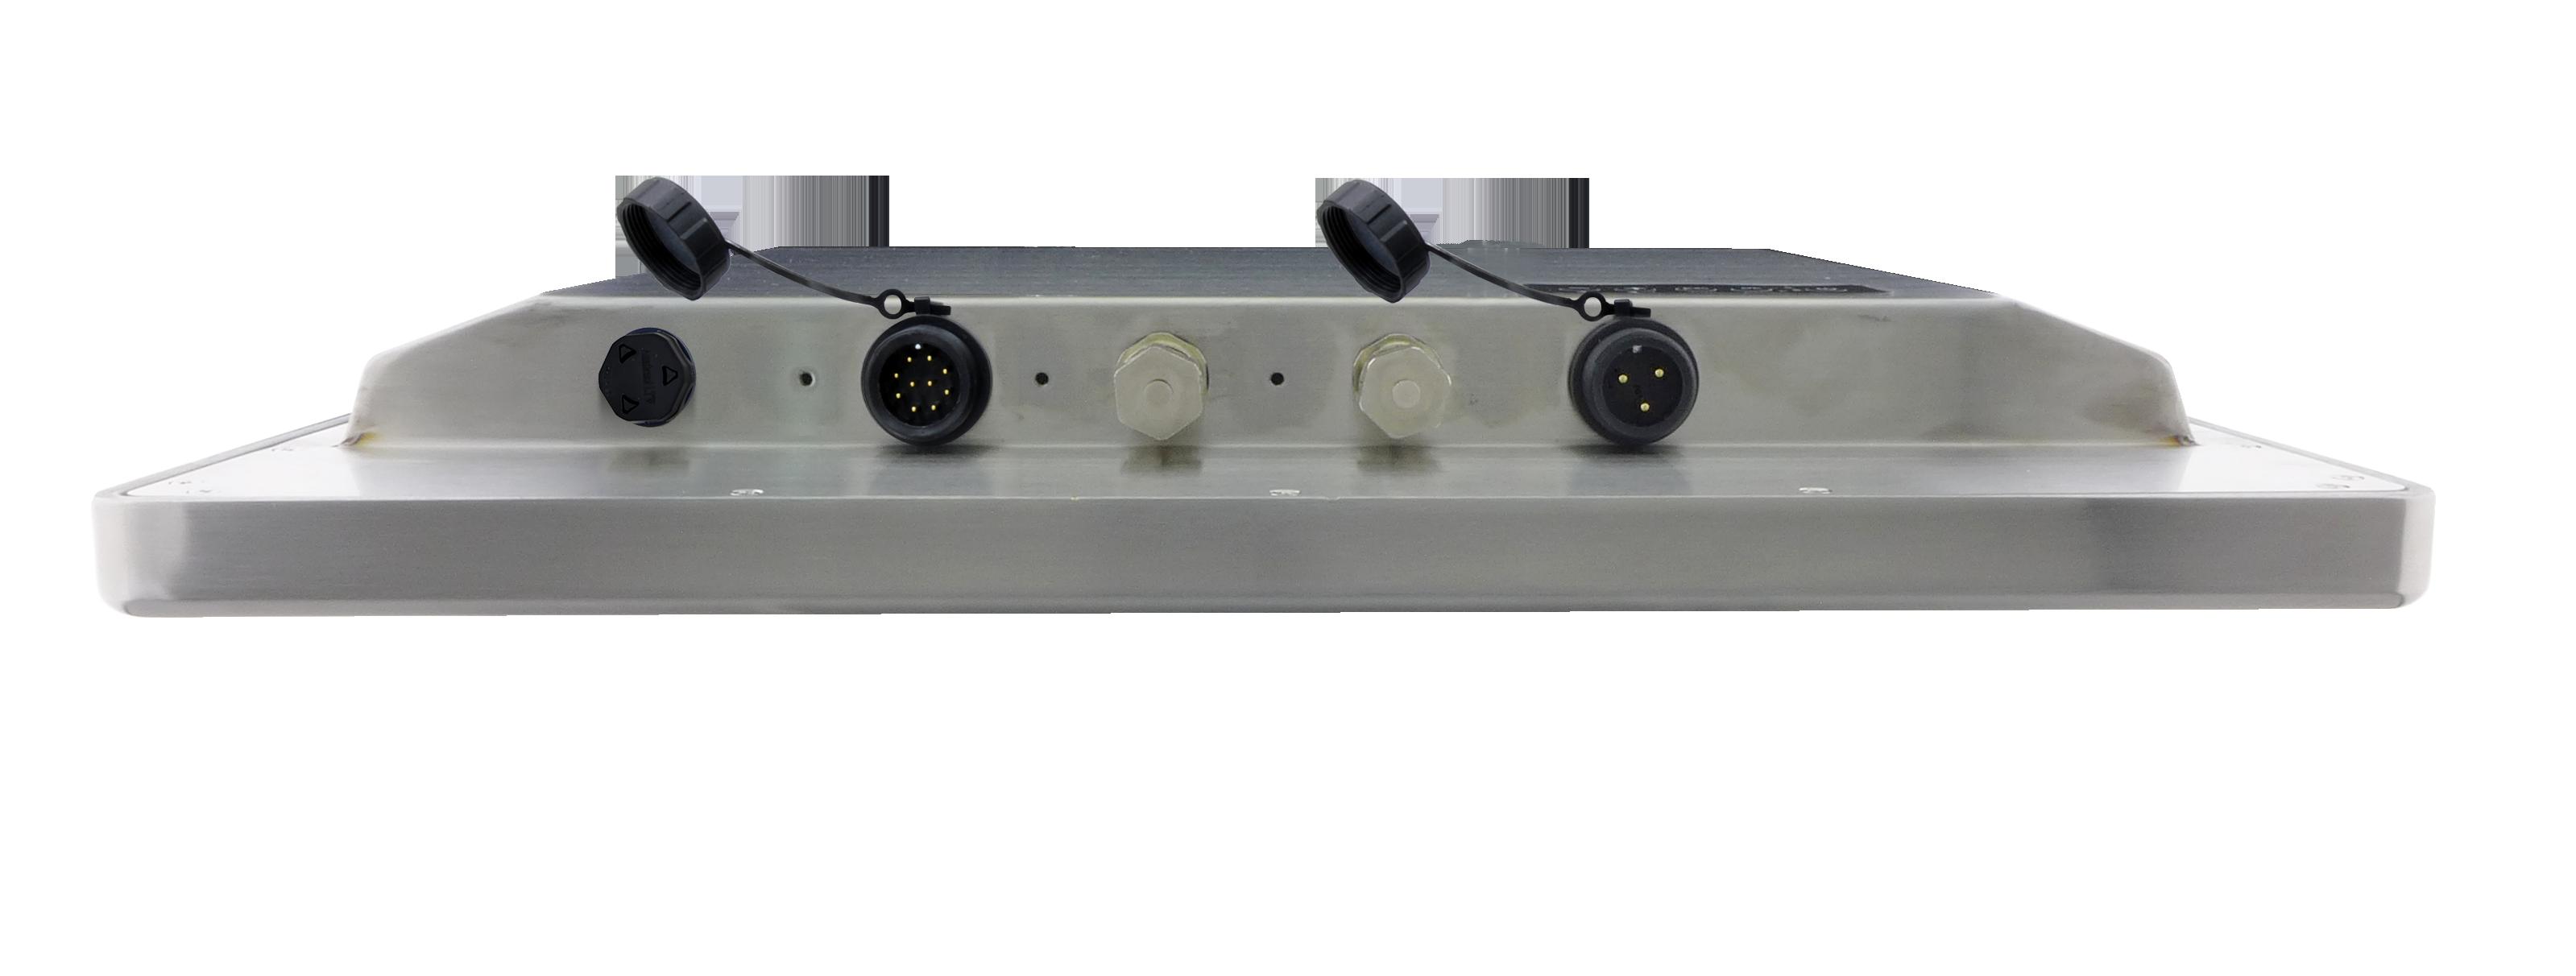 R15L600-65EX Stainless Steel ATEX display · Impulse Embedded